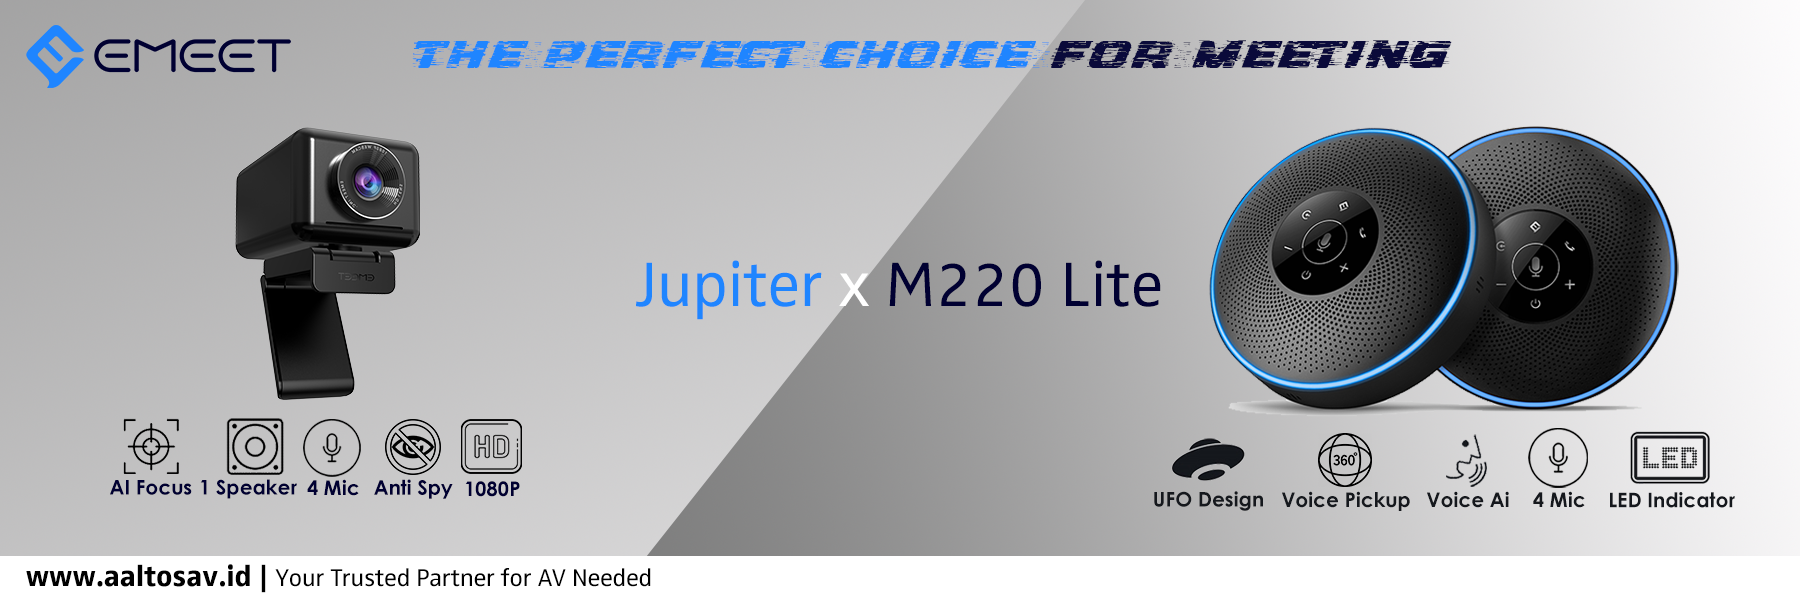 eMeet Jupiter X M220 Lite